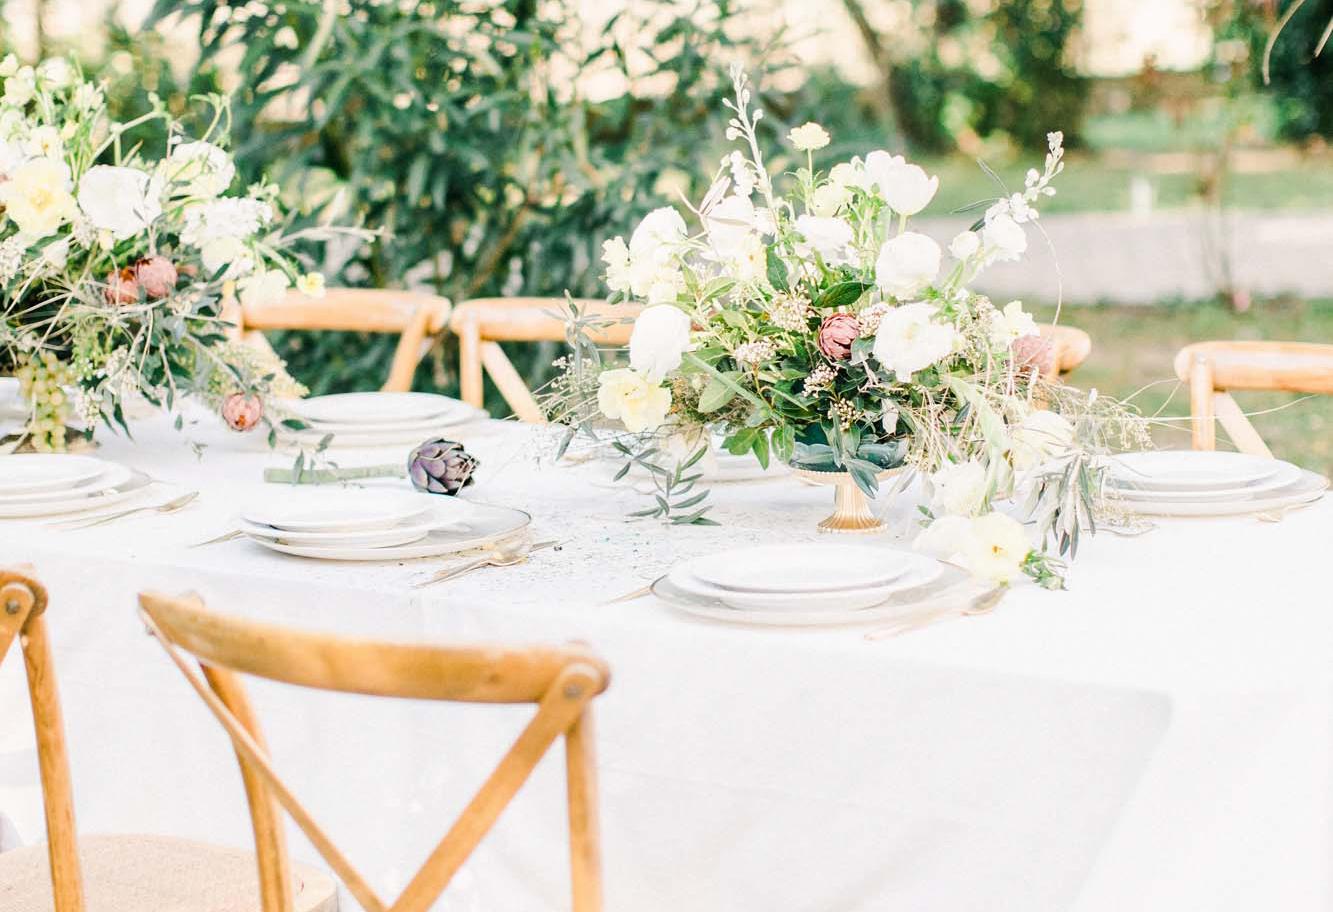 Melanie Sharma | Hochzeitsdekoration